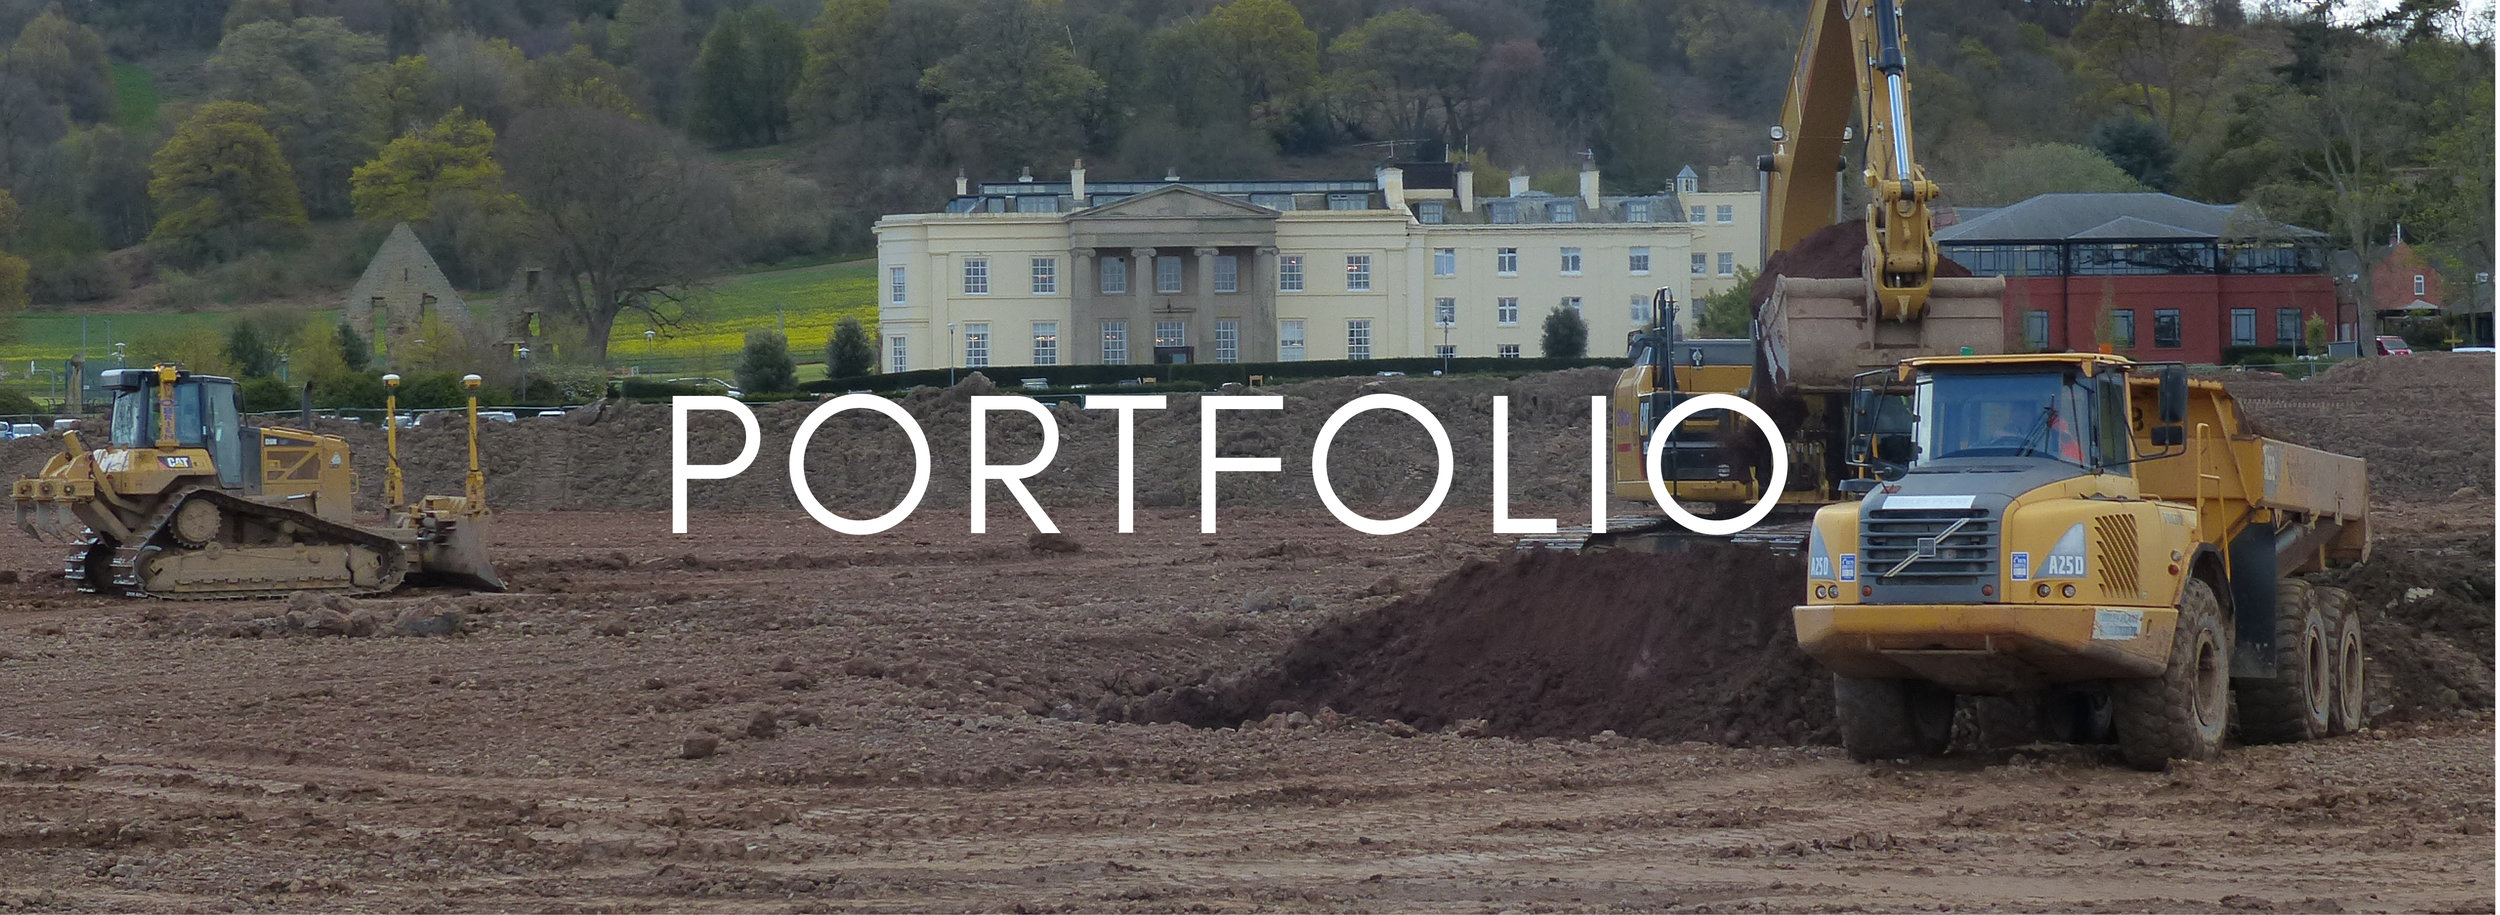 sports-pitch-construction-sports-pitch-drainage-golf-course-construction-golf-course-drainage-portfolio